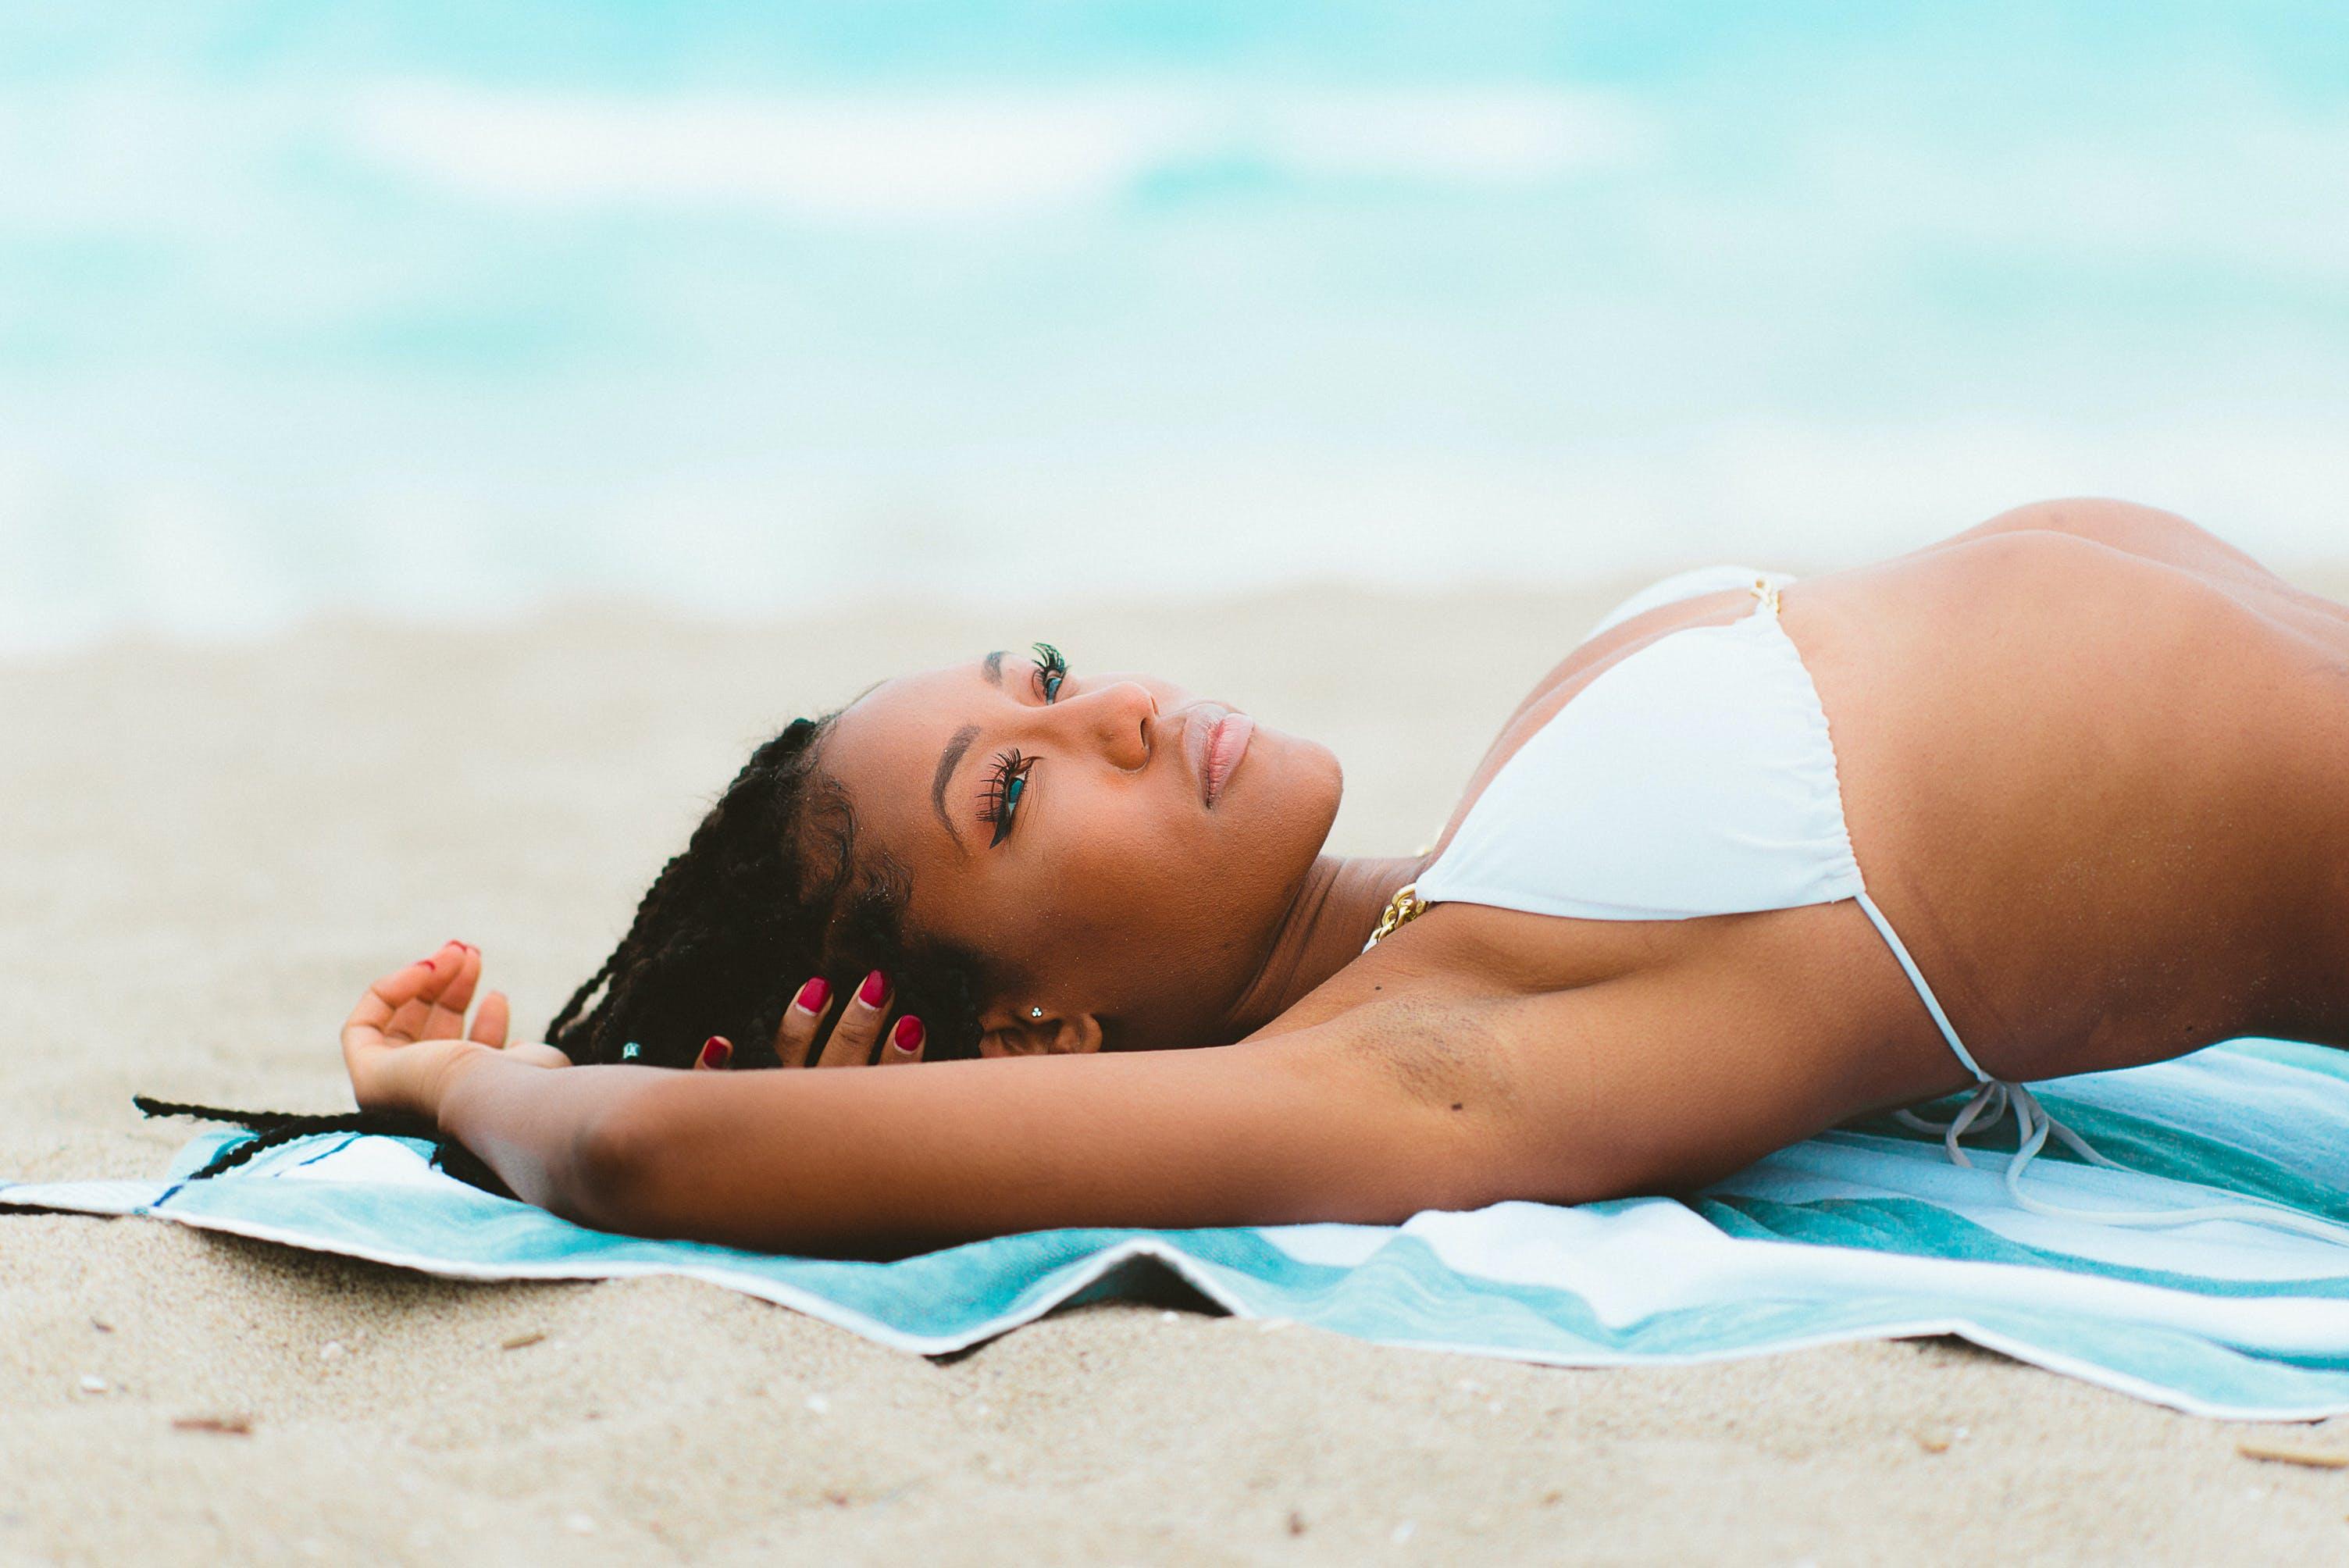 badeanzug, bikini, bräunung